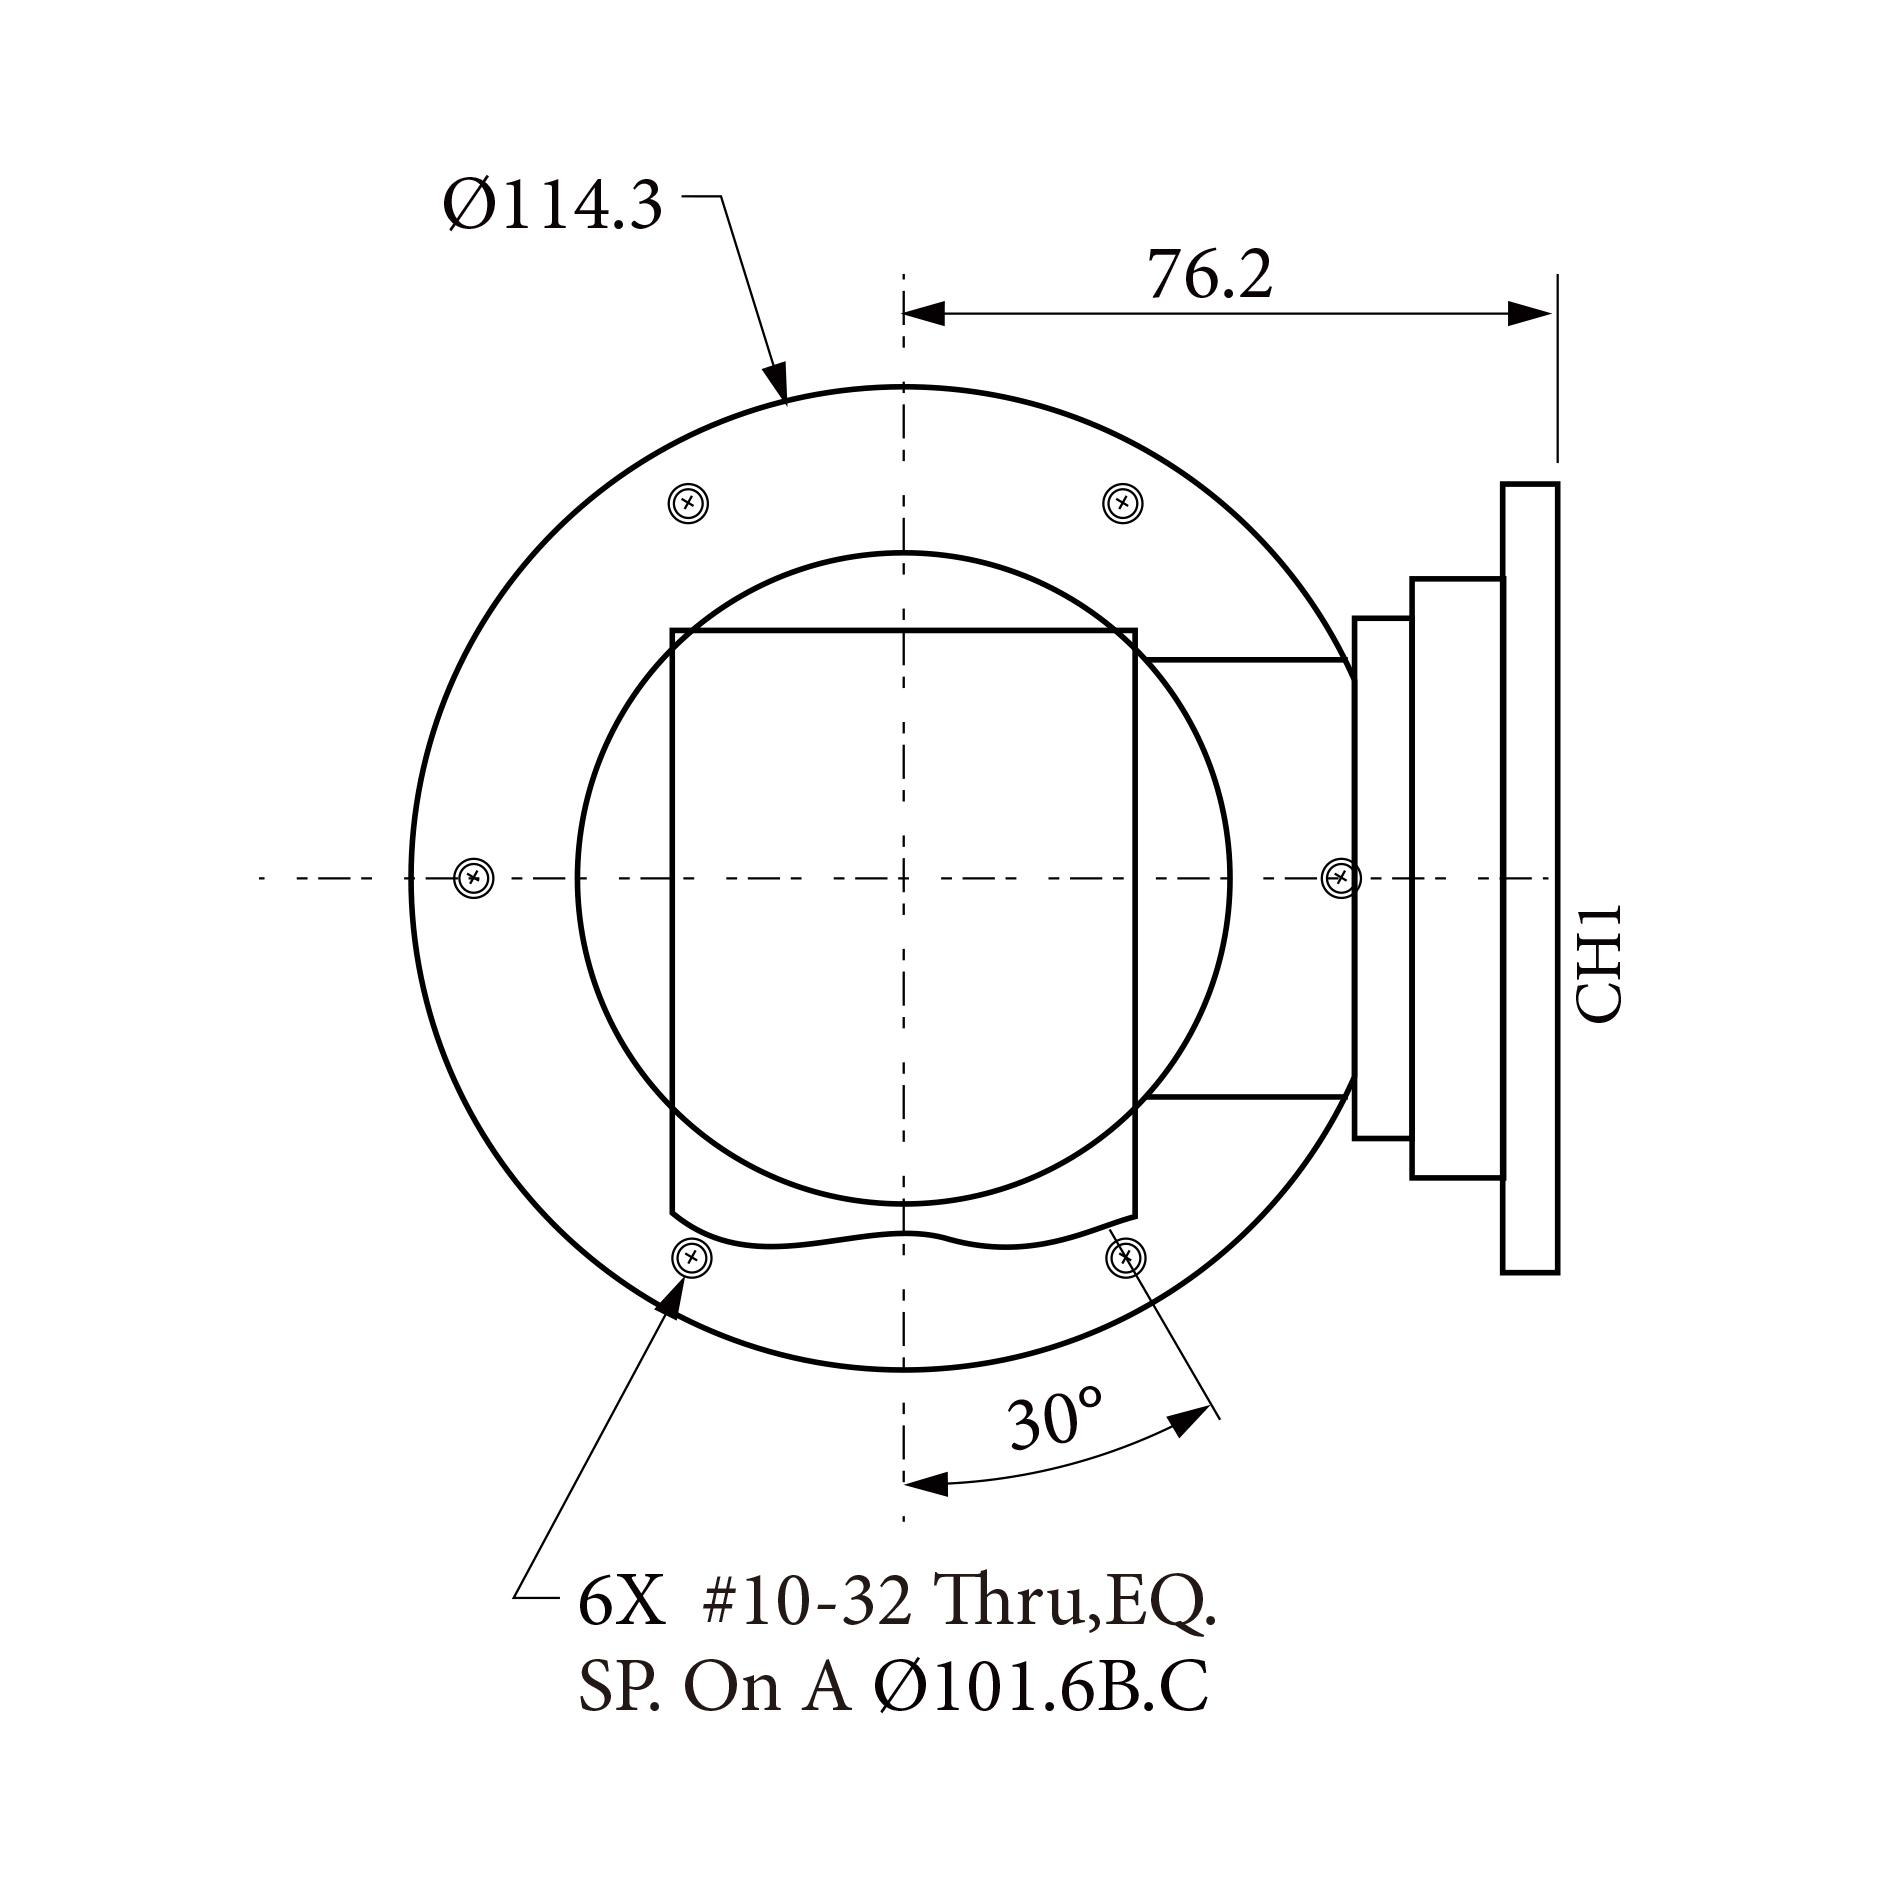 三路旋转关节RJ153186 1CH  2CH 3CH均为5.4 ~5.9 GHz  WR 187 Flange